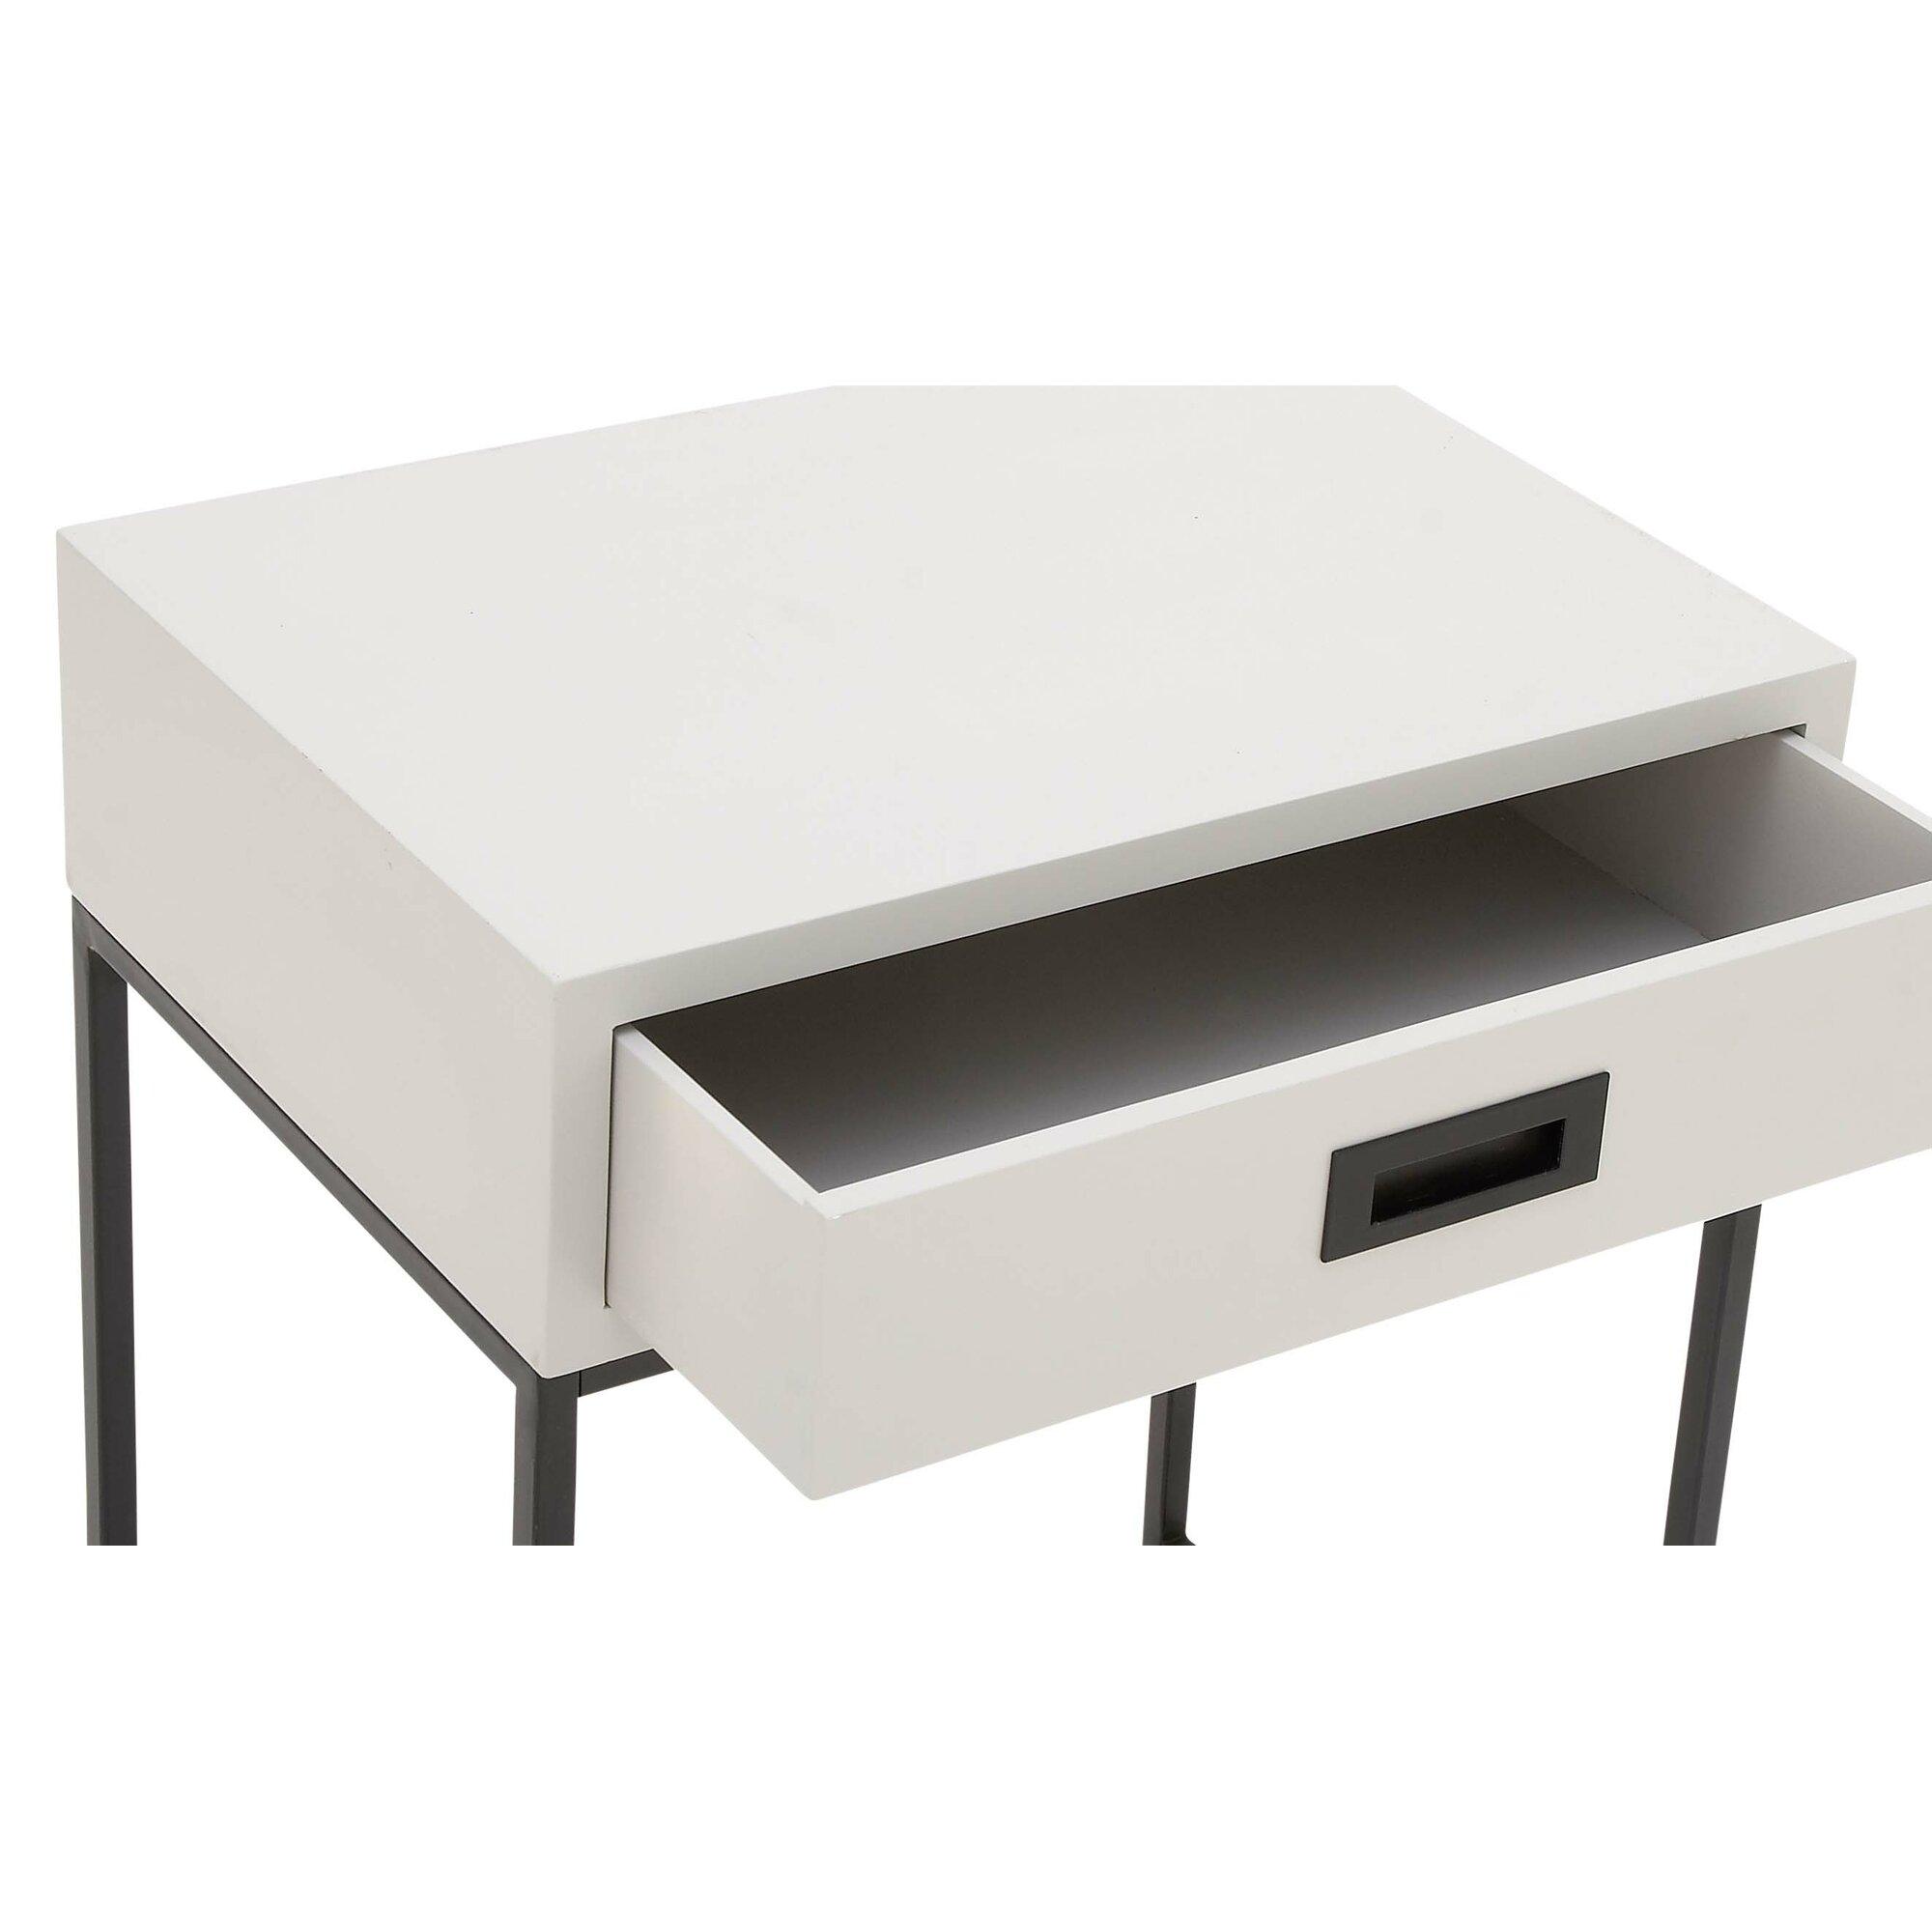 wood and metal end table reviews allmodern. Black Bedroom Furniture Sets. Home Design Ideas